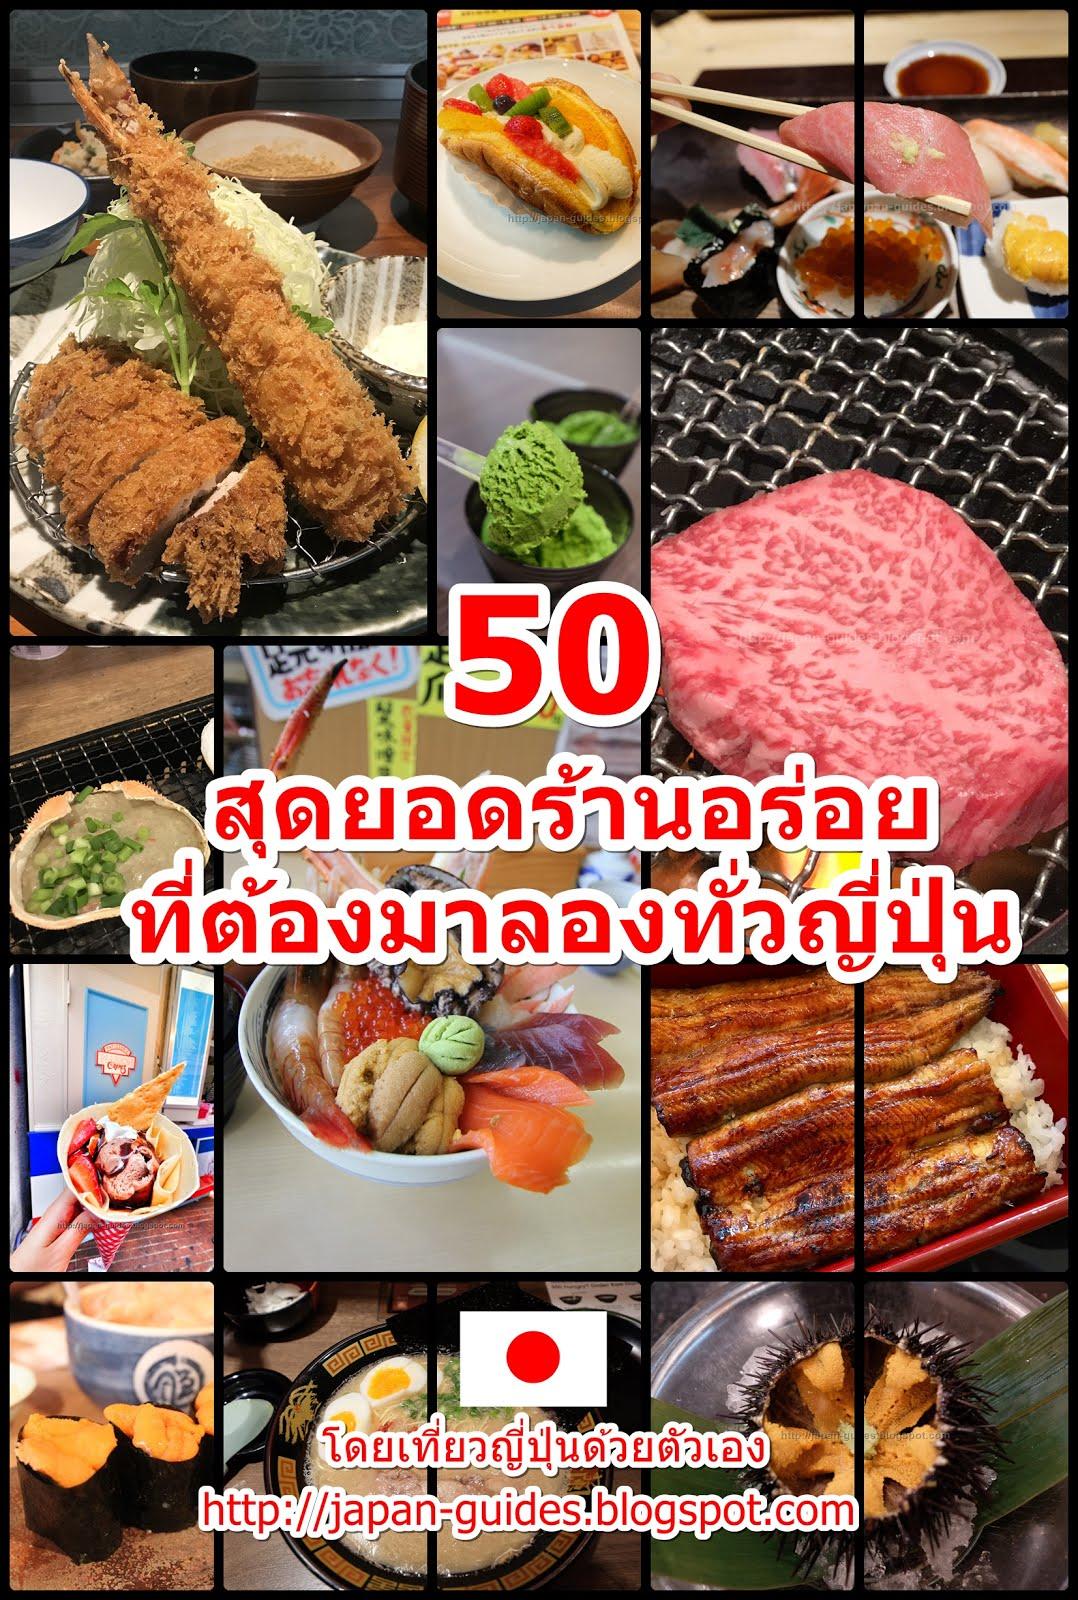 Ebook 50 สุดยอดร้านอร่อยในญี่ปุ่น